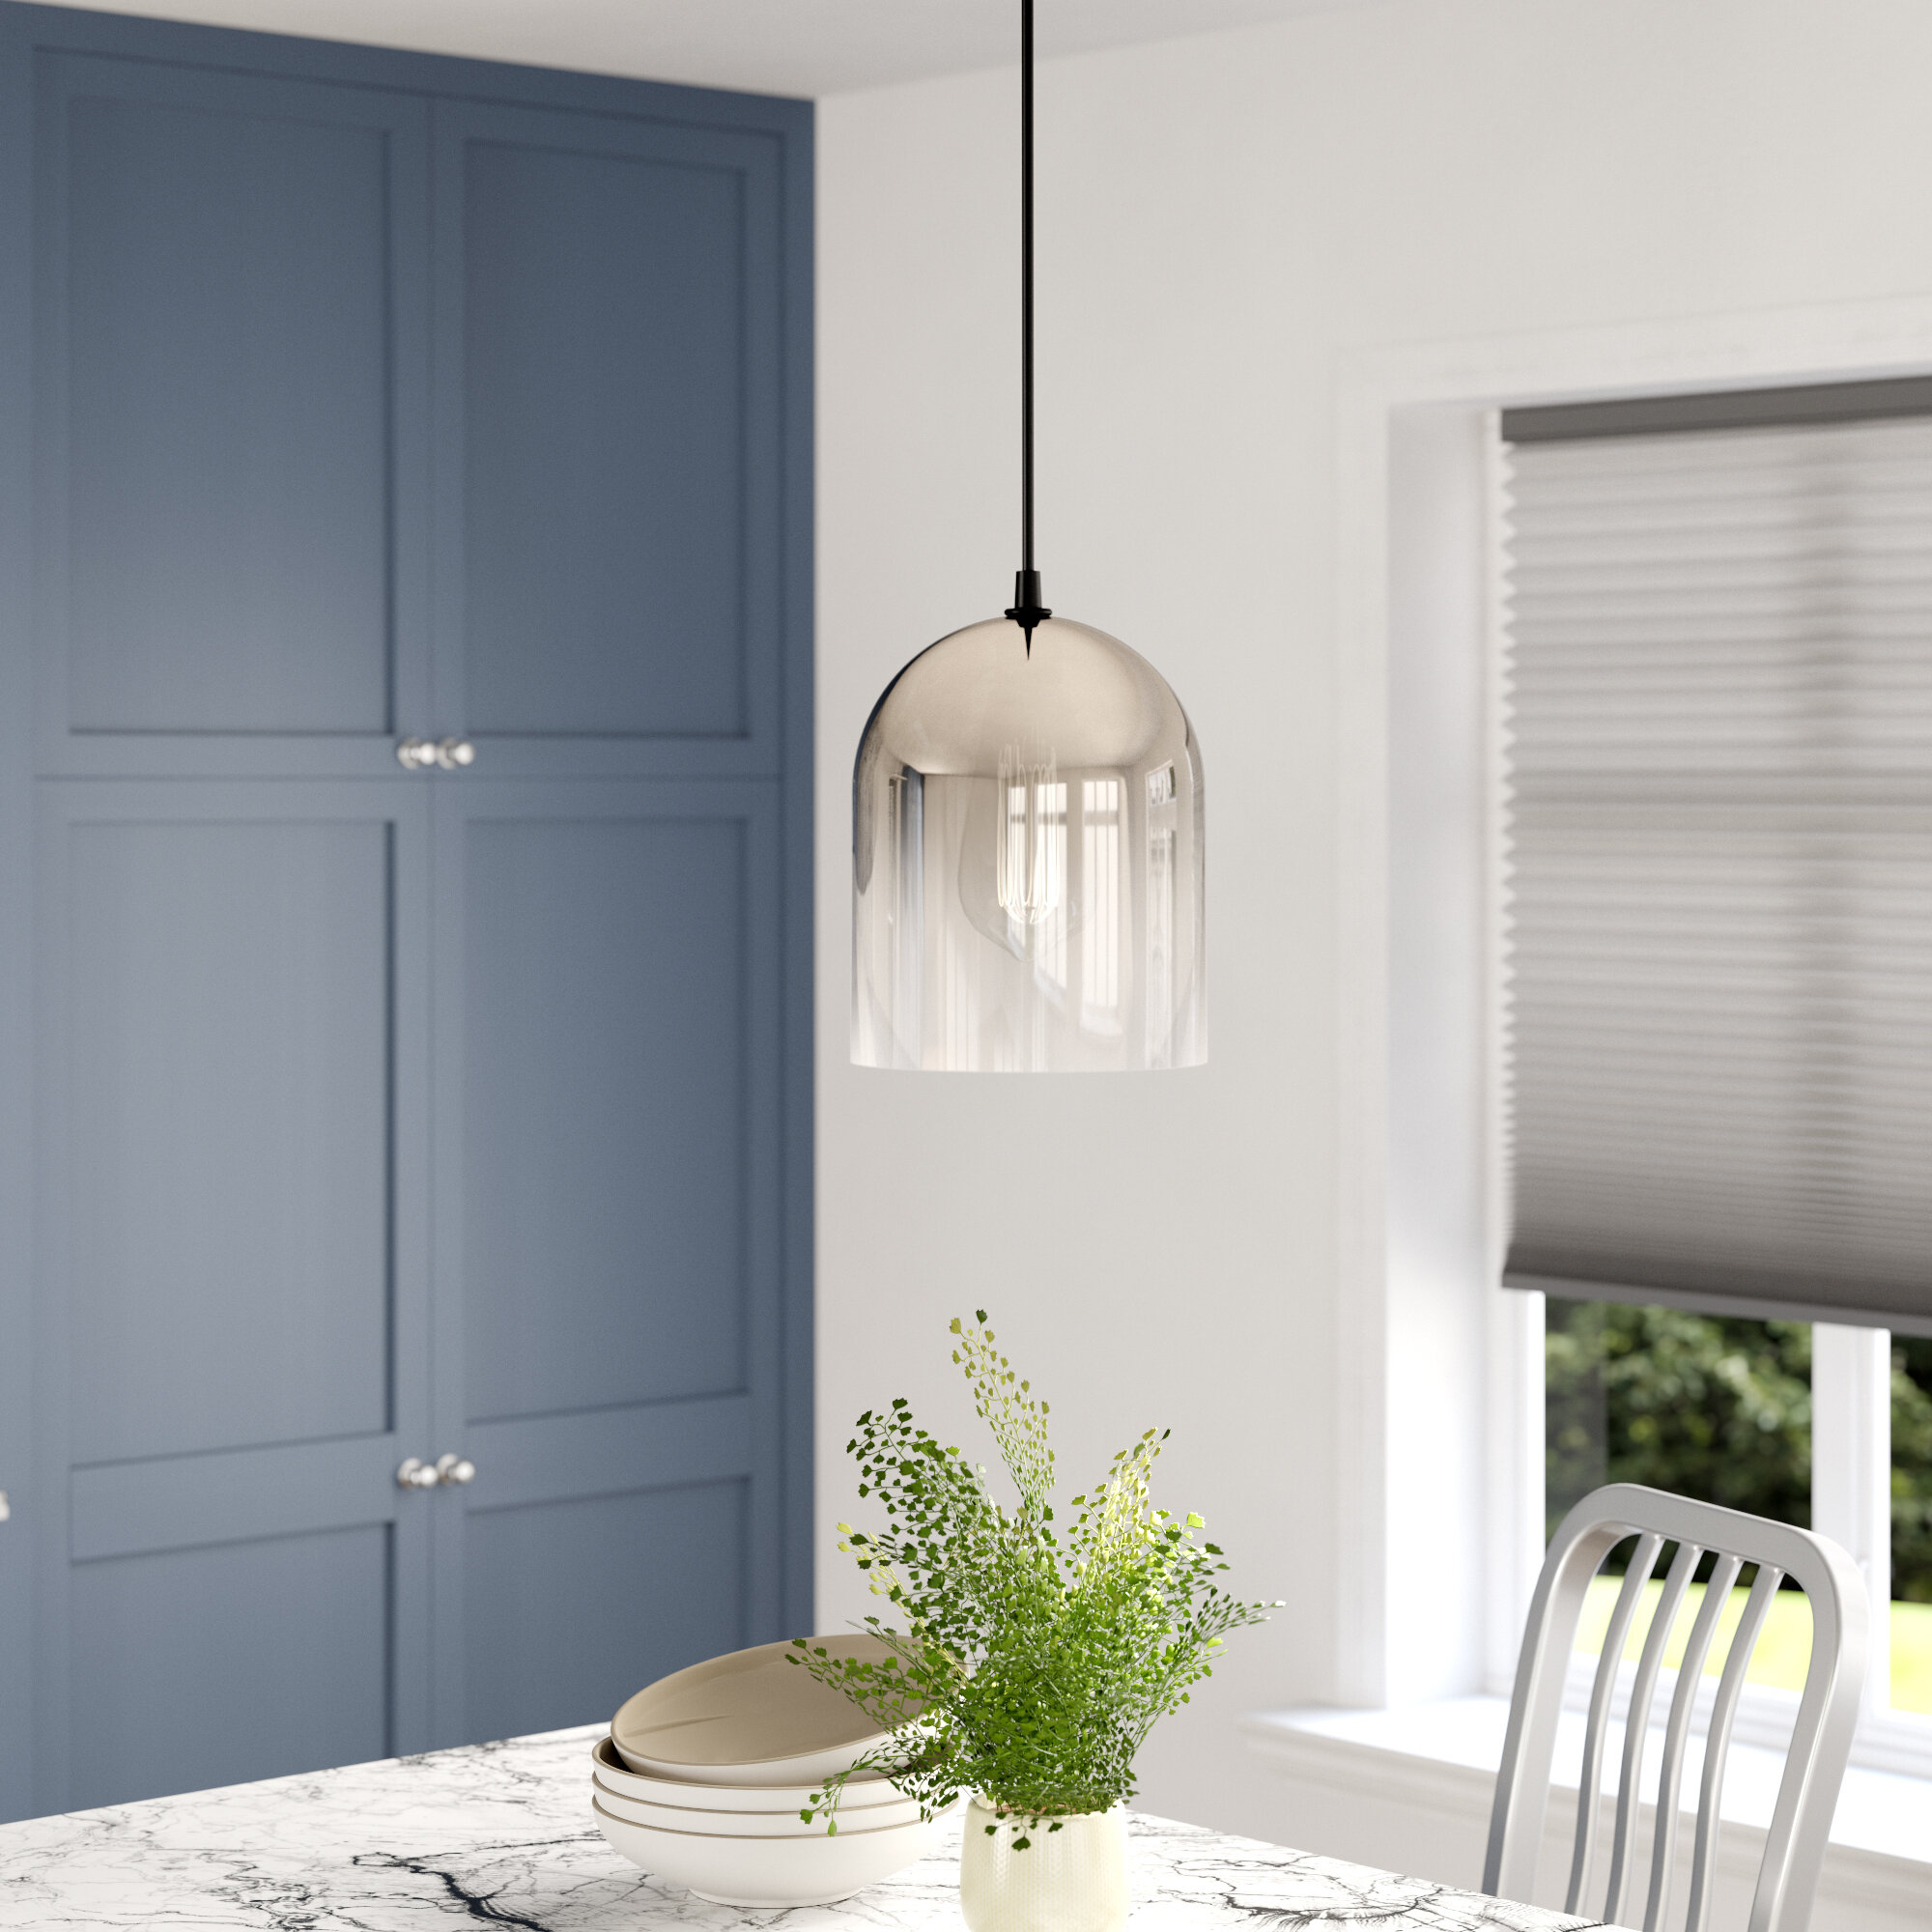 Ebern Designs Mccue 1 Light Single Bell Pendant & Reviews Within Giacinta 1 Light Single Bell Pendants (Gallery 2 of 30)